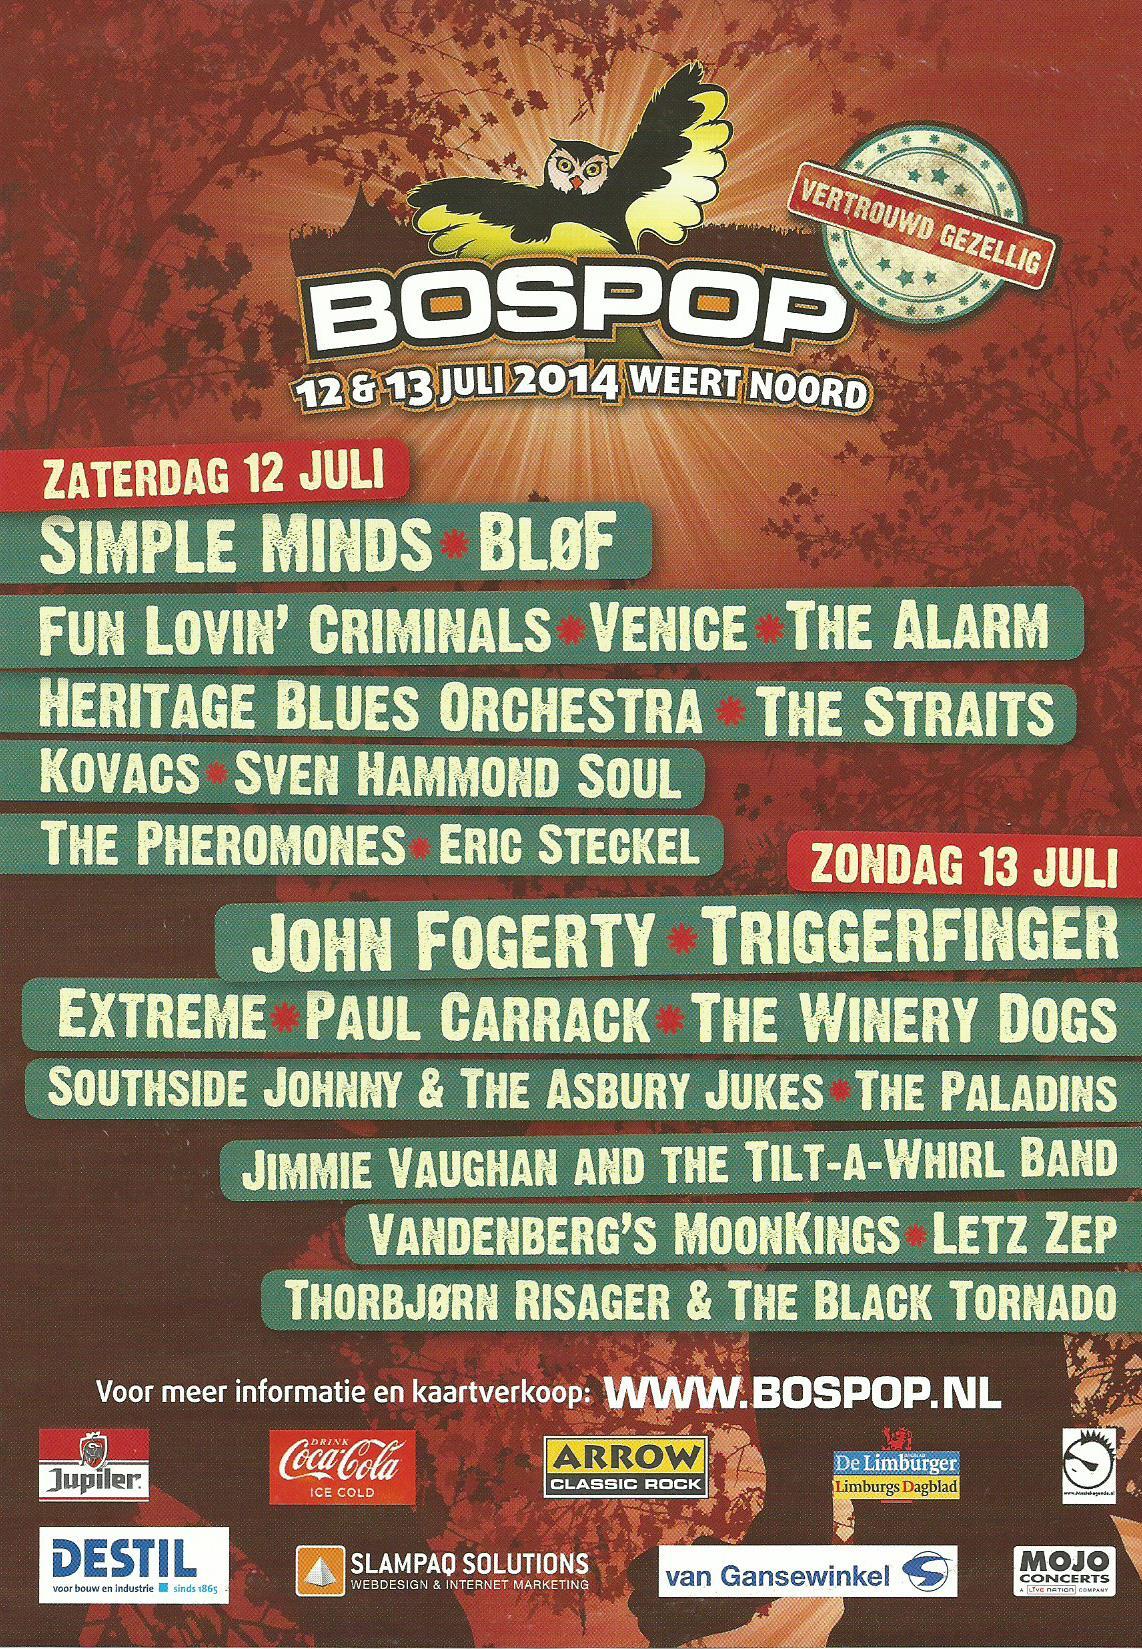 Bospop programme